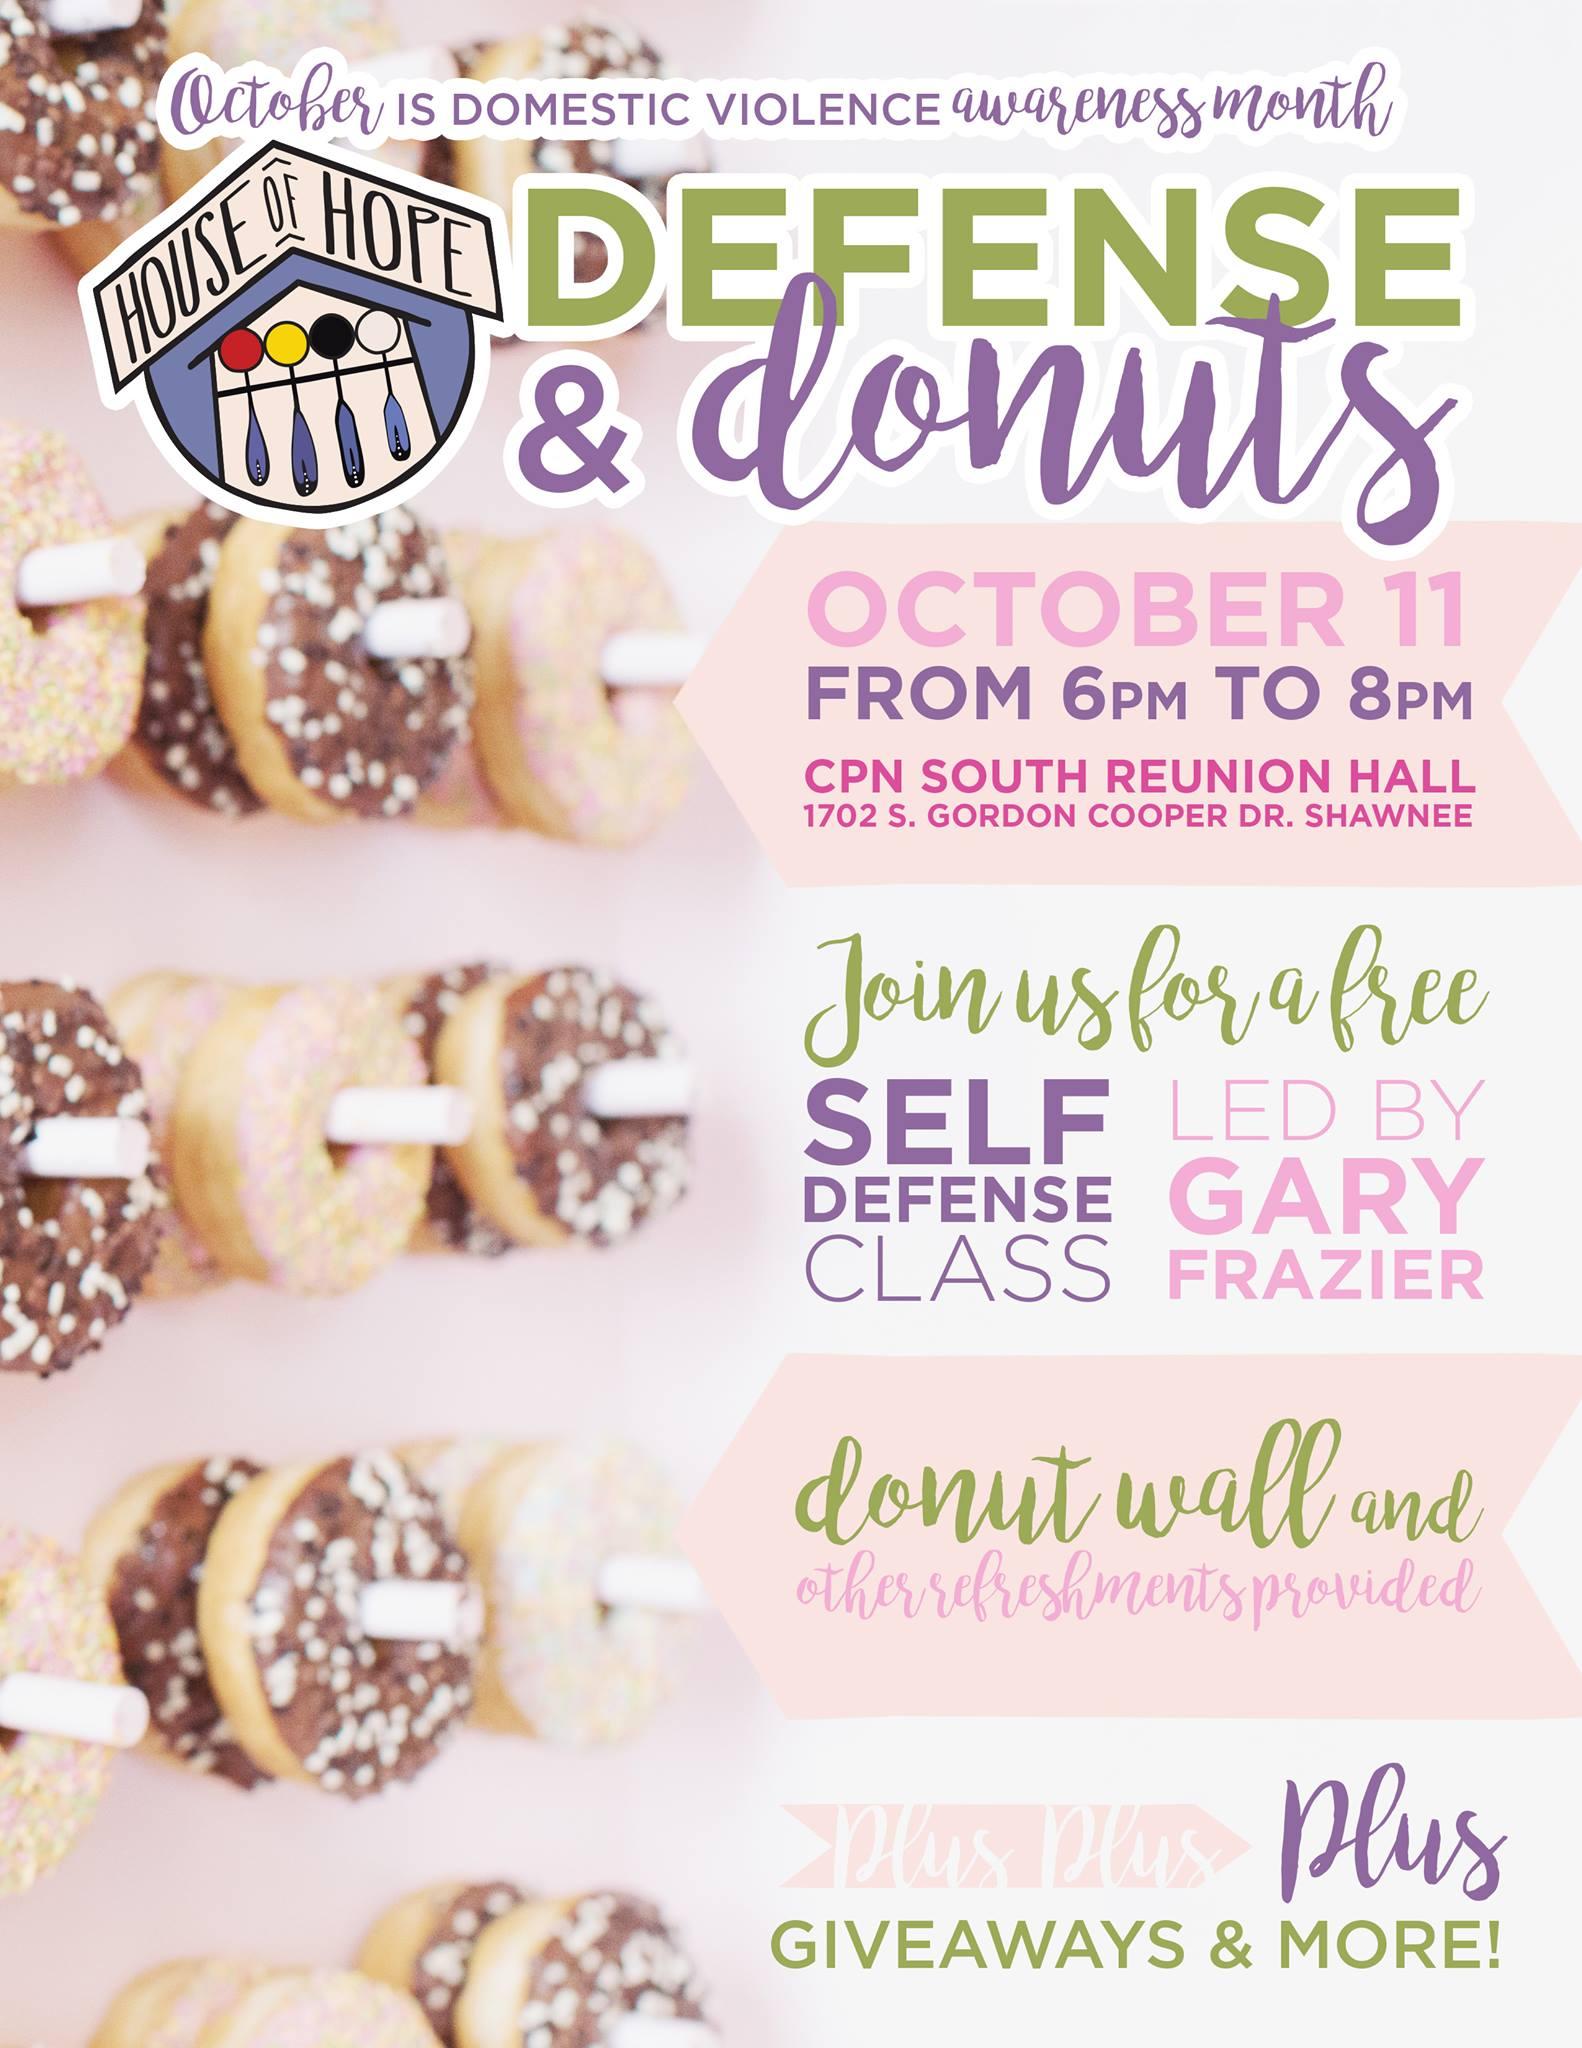 CPN Defense Donuts 2018.jpg